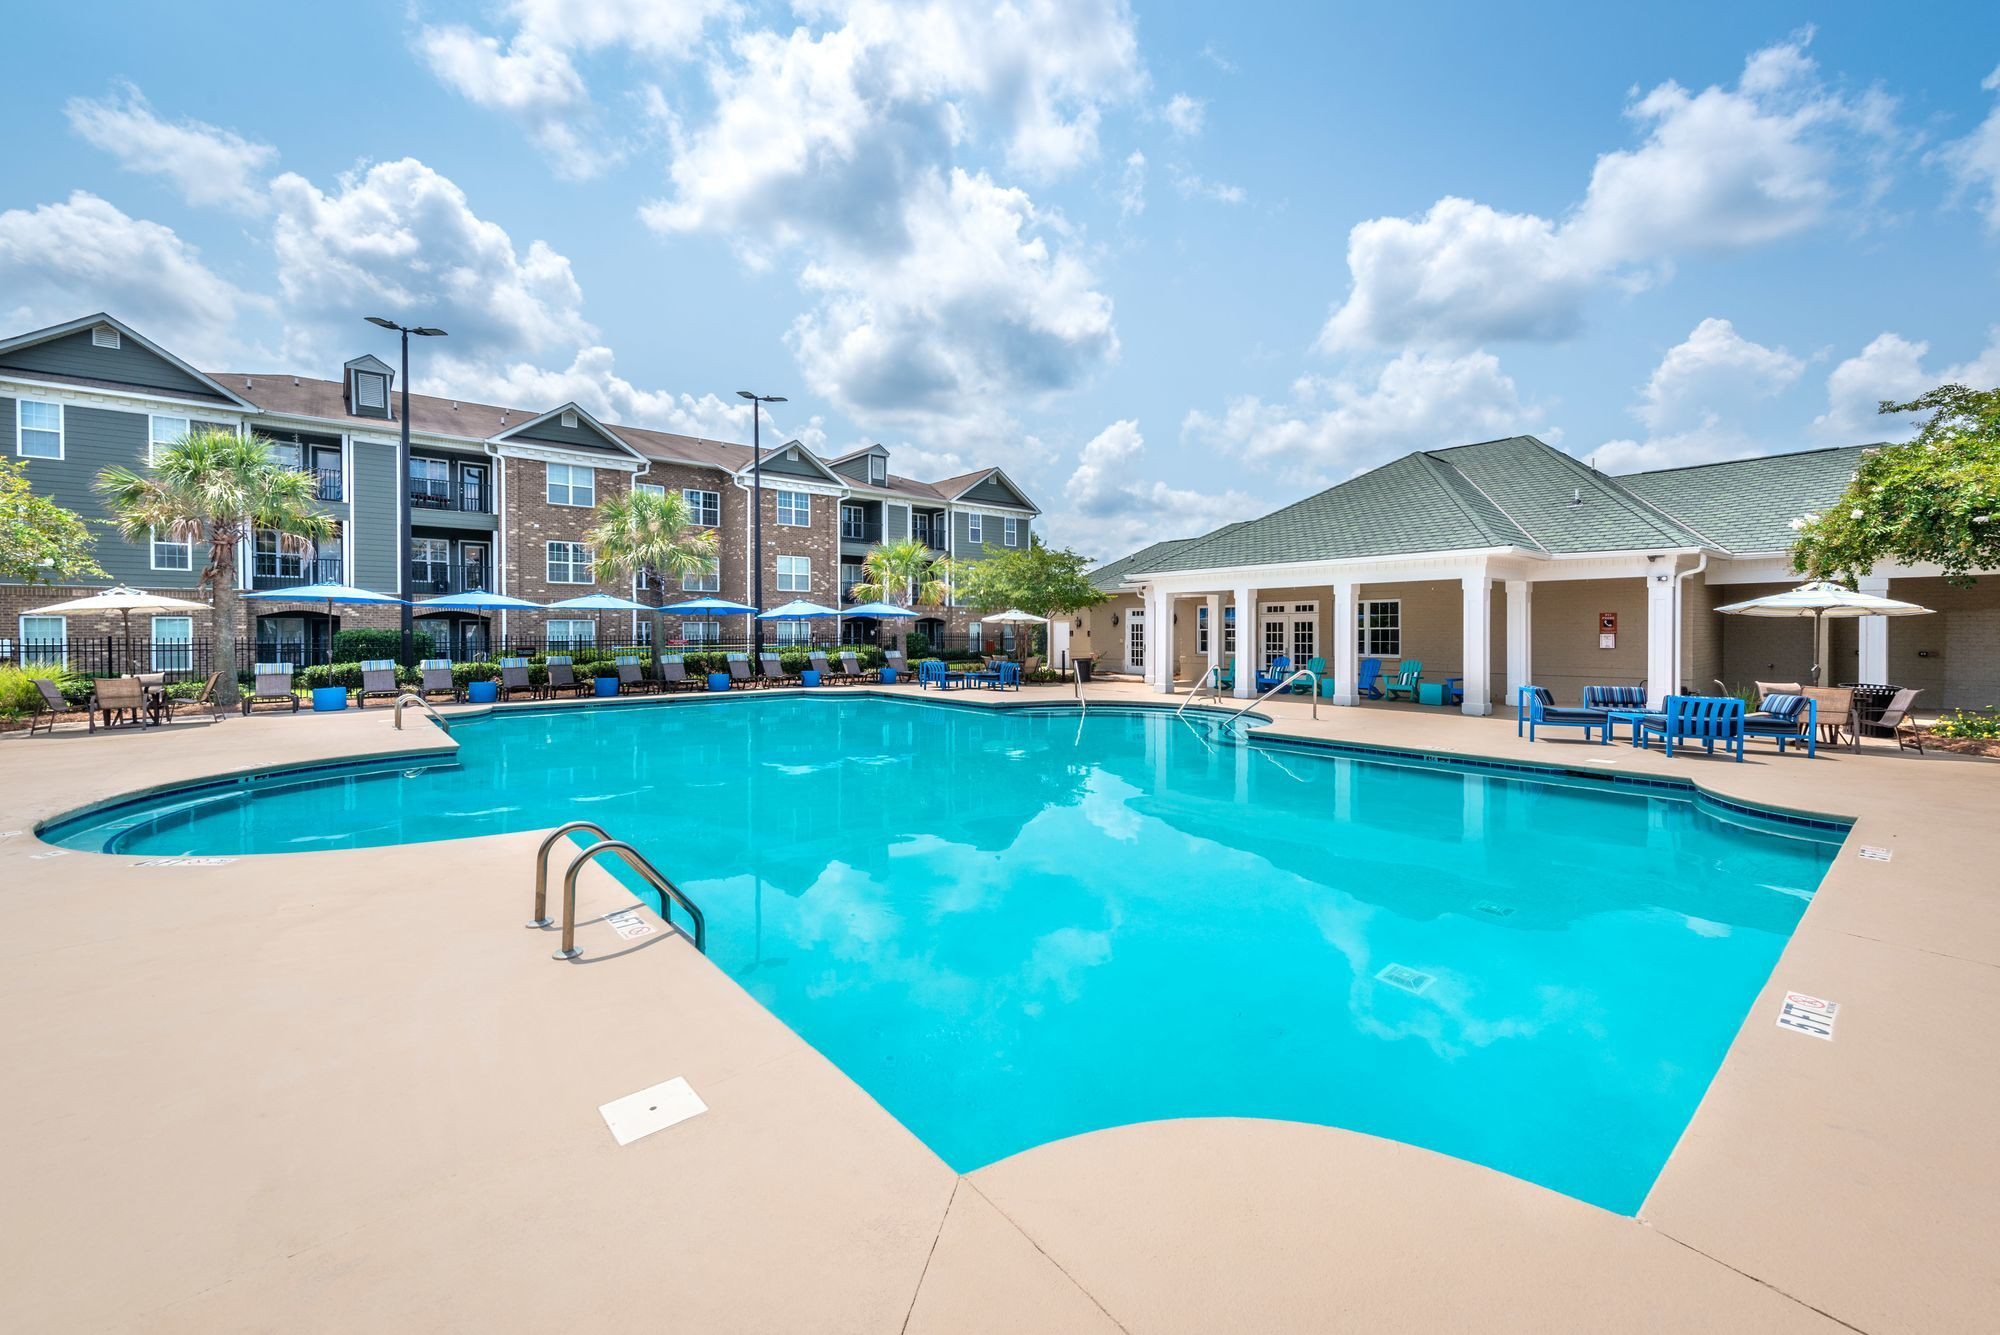 Apartments Near AASU Olympus Carrington for Armstrong Atlantic State University Students in Savannah, GA